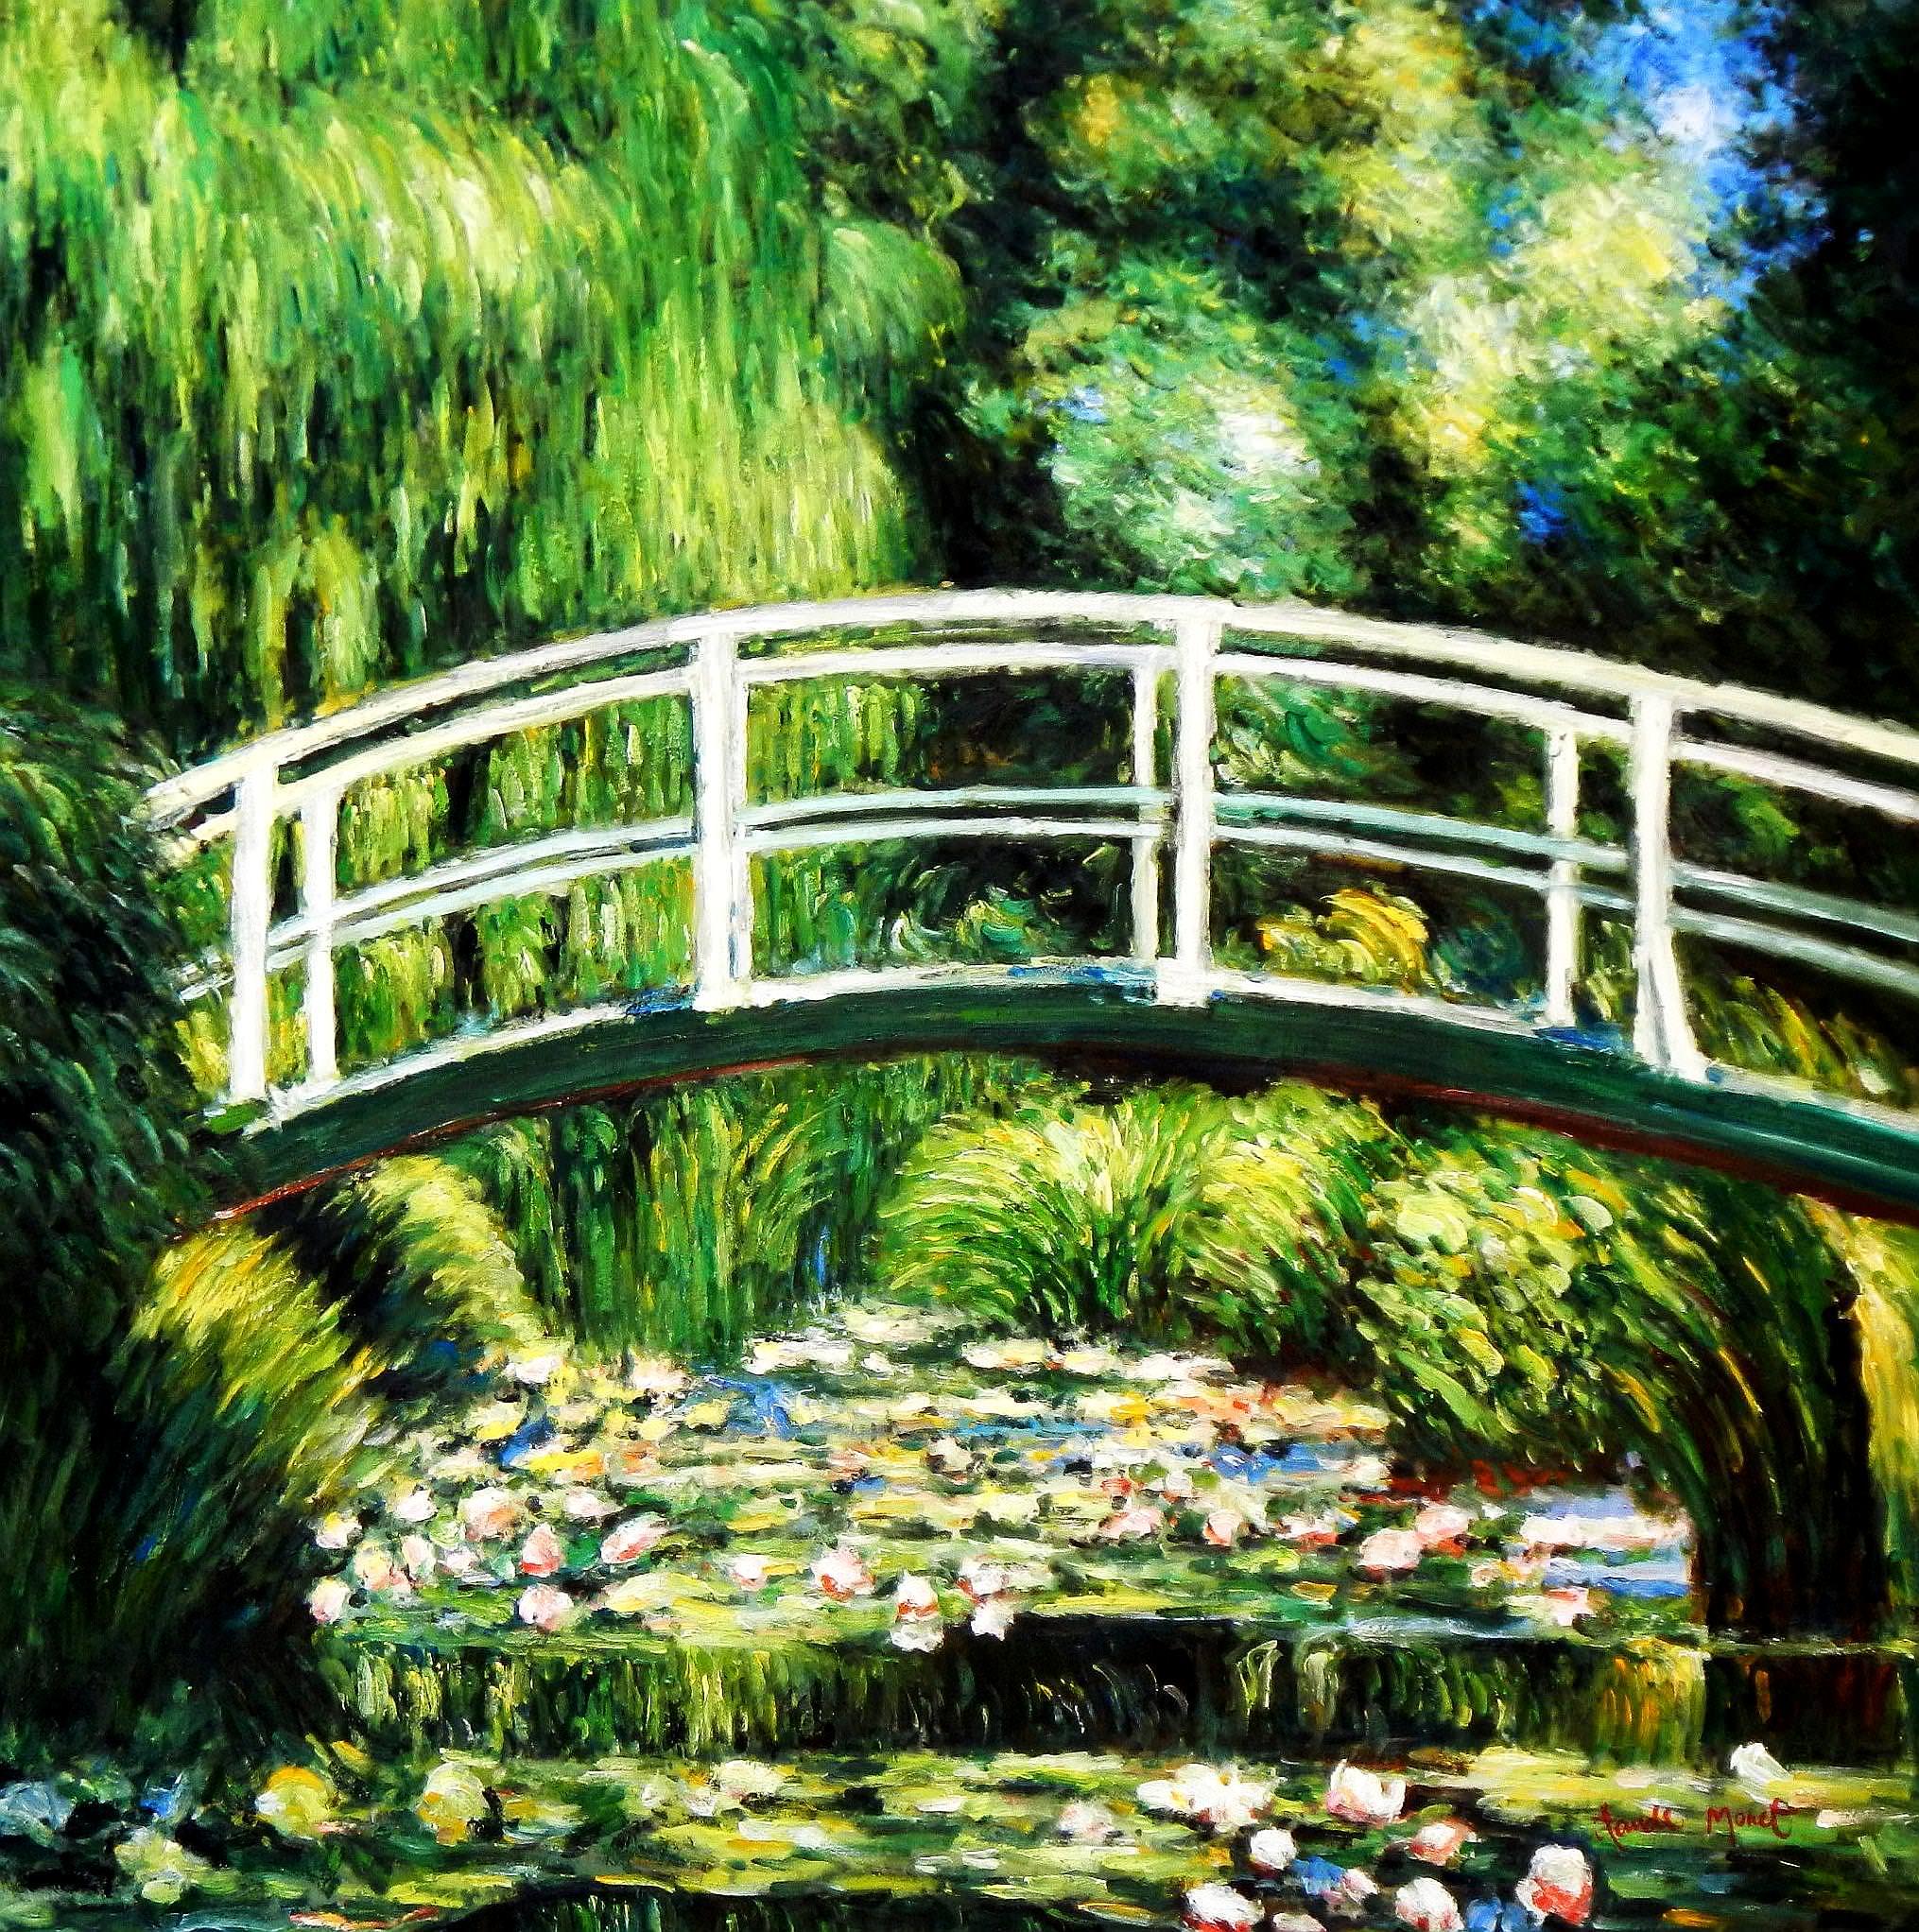 Claude Monet - Japanische Brücke m93807 120x120cm Ölgemälde handgemalt Museumsqualität